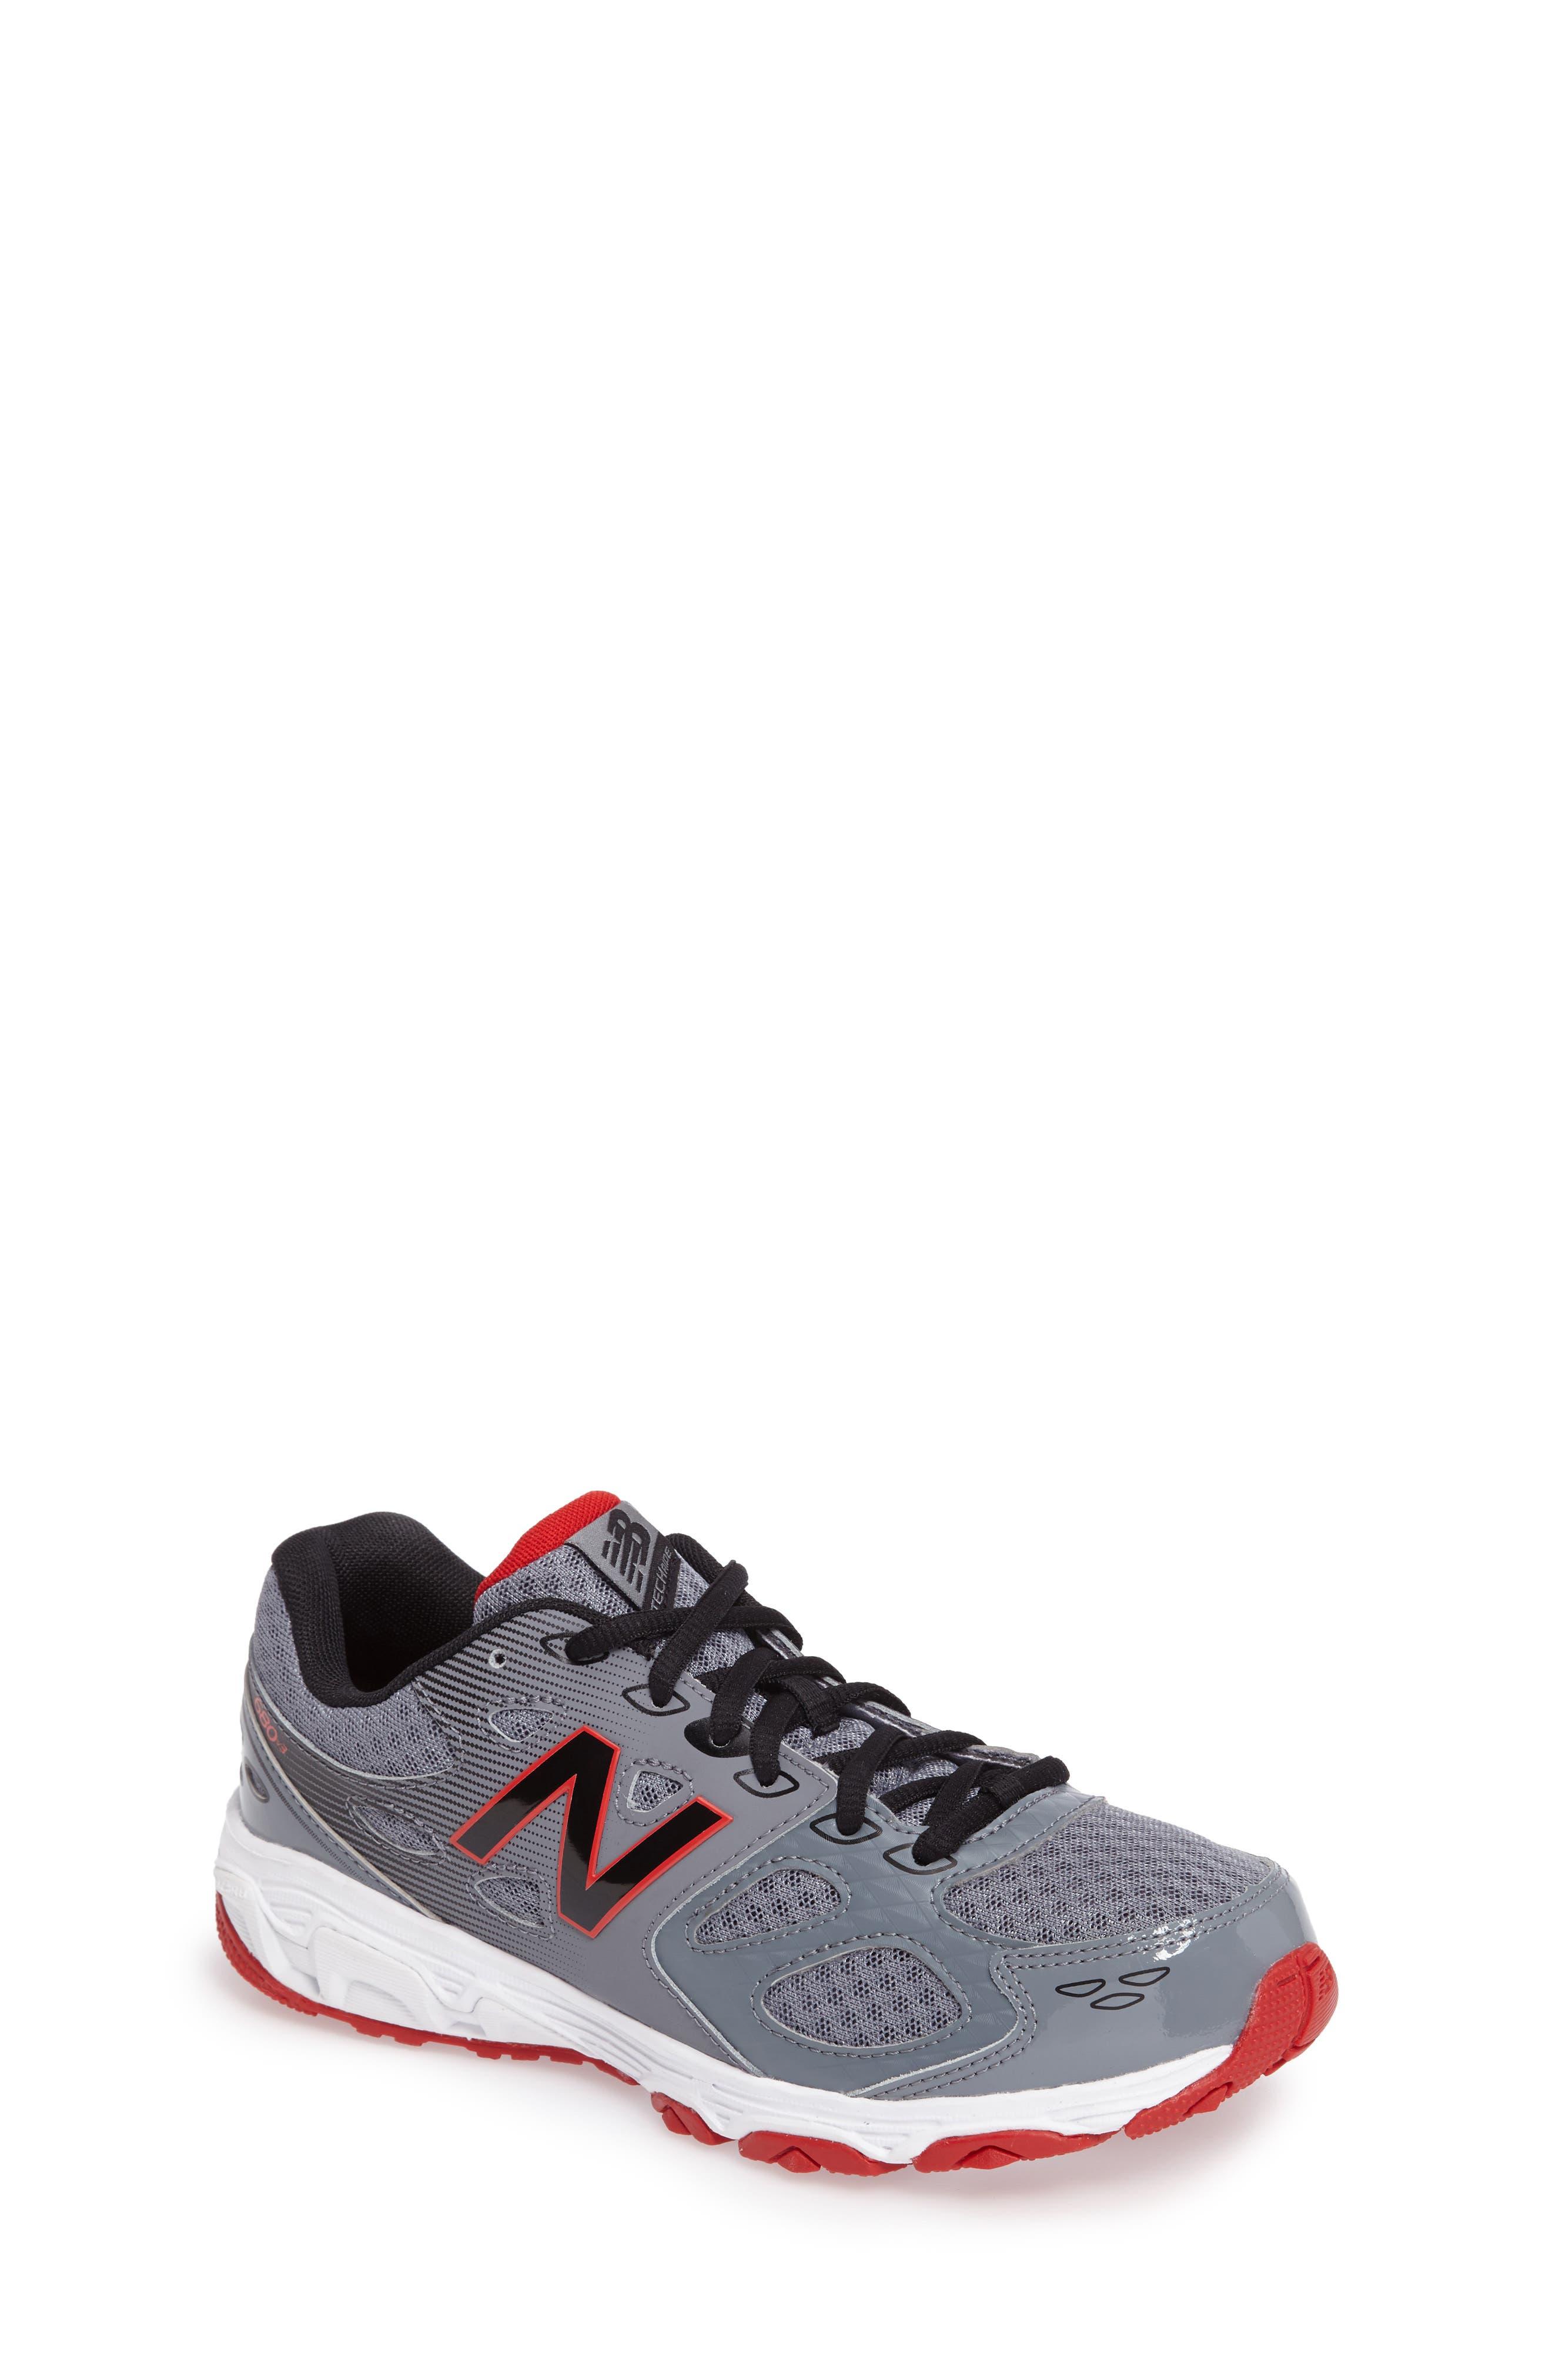 680v3 Sneaker,                             Main thumbnail 1, color,                             061